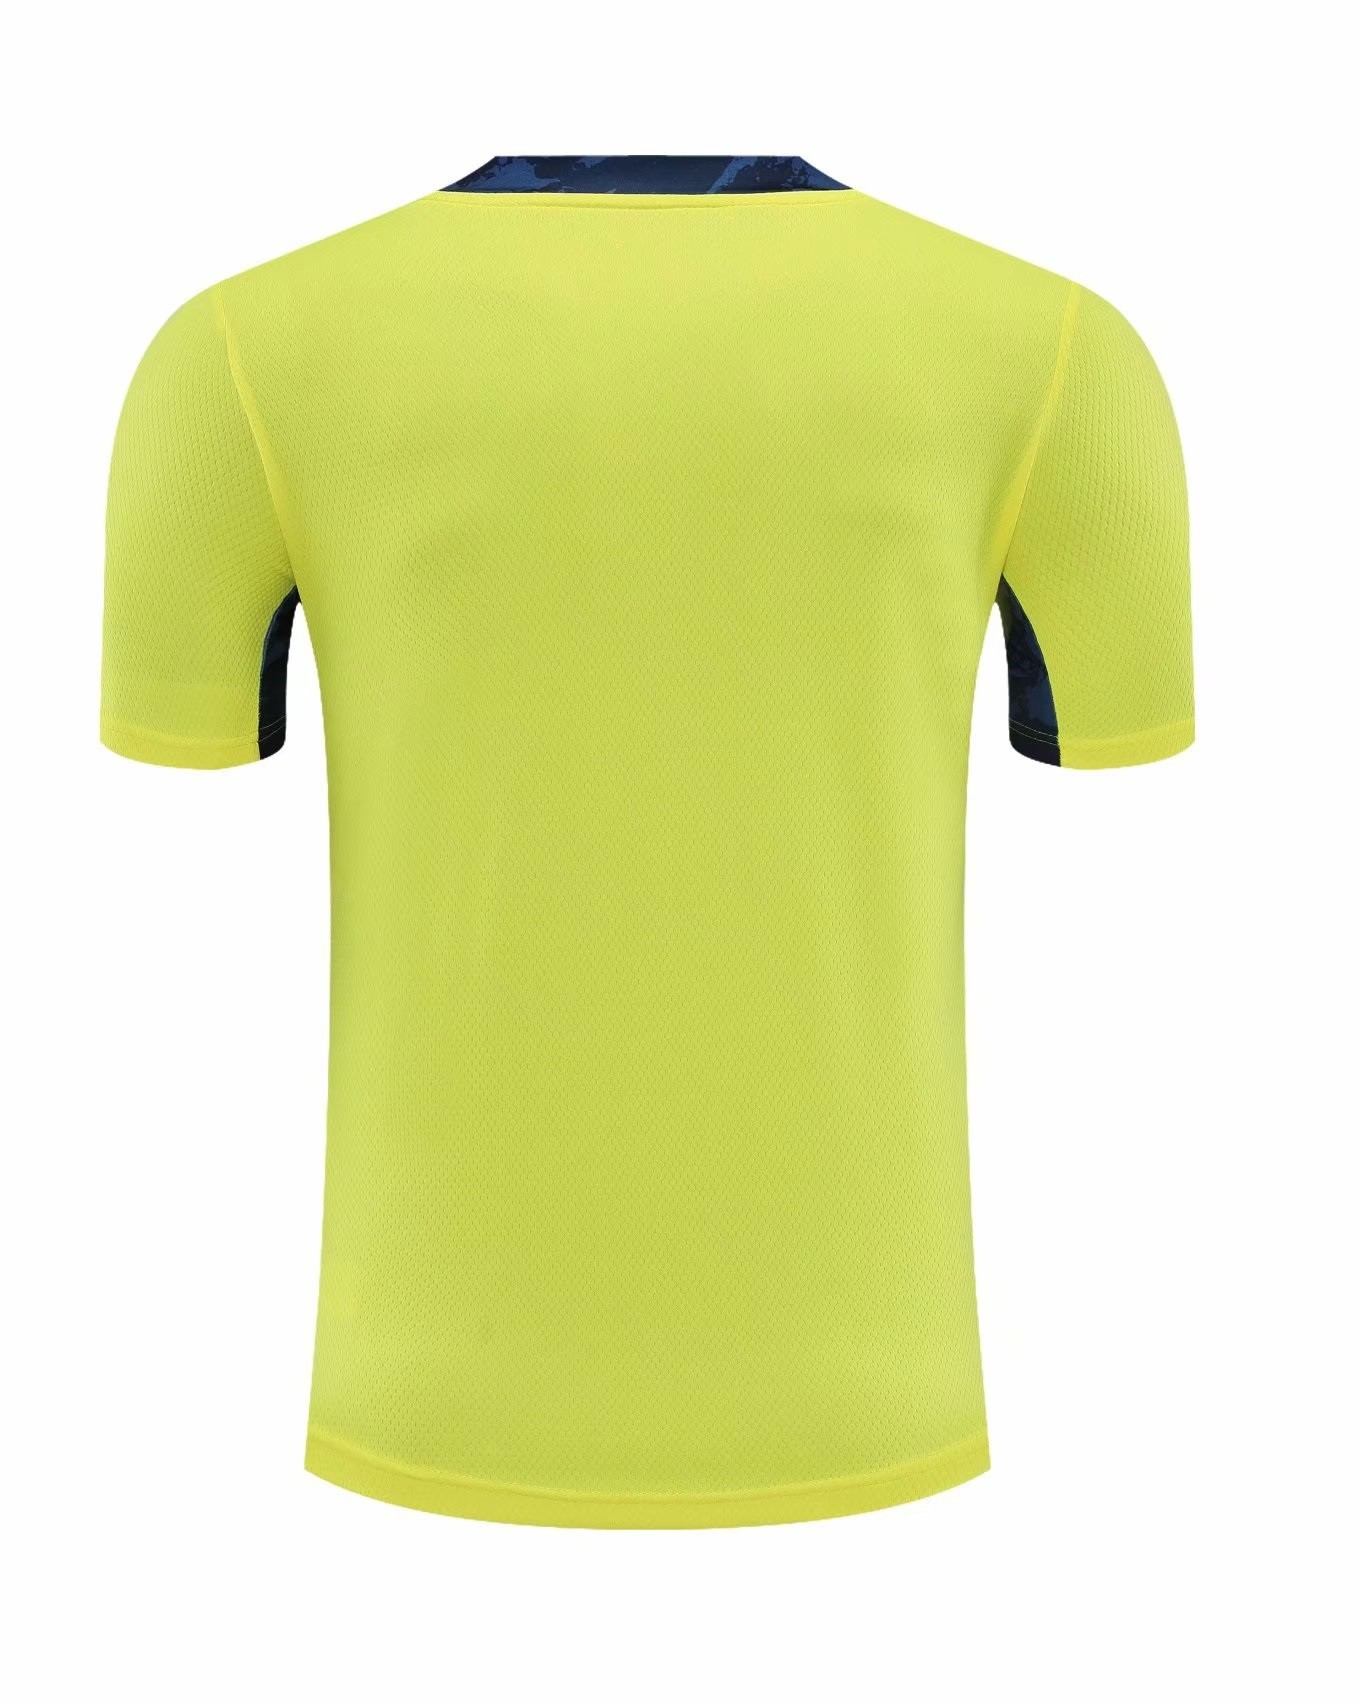 JUVENTUS FC CAMISA MASCULINA 2021, UNIFORME GOLEIRO